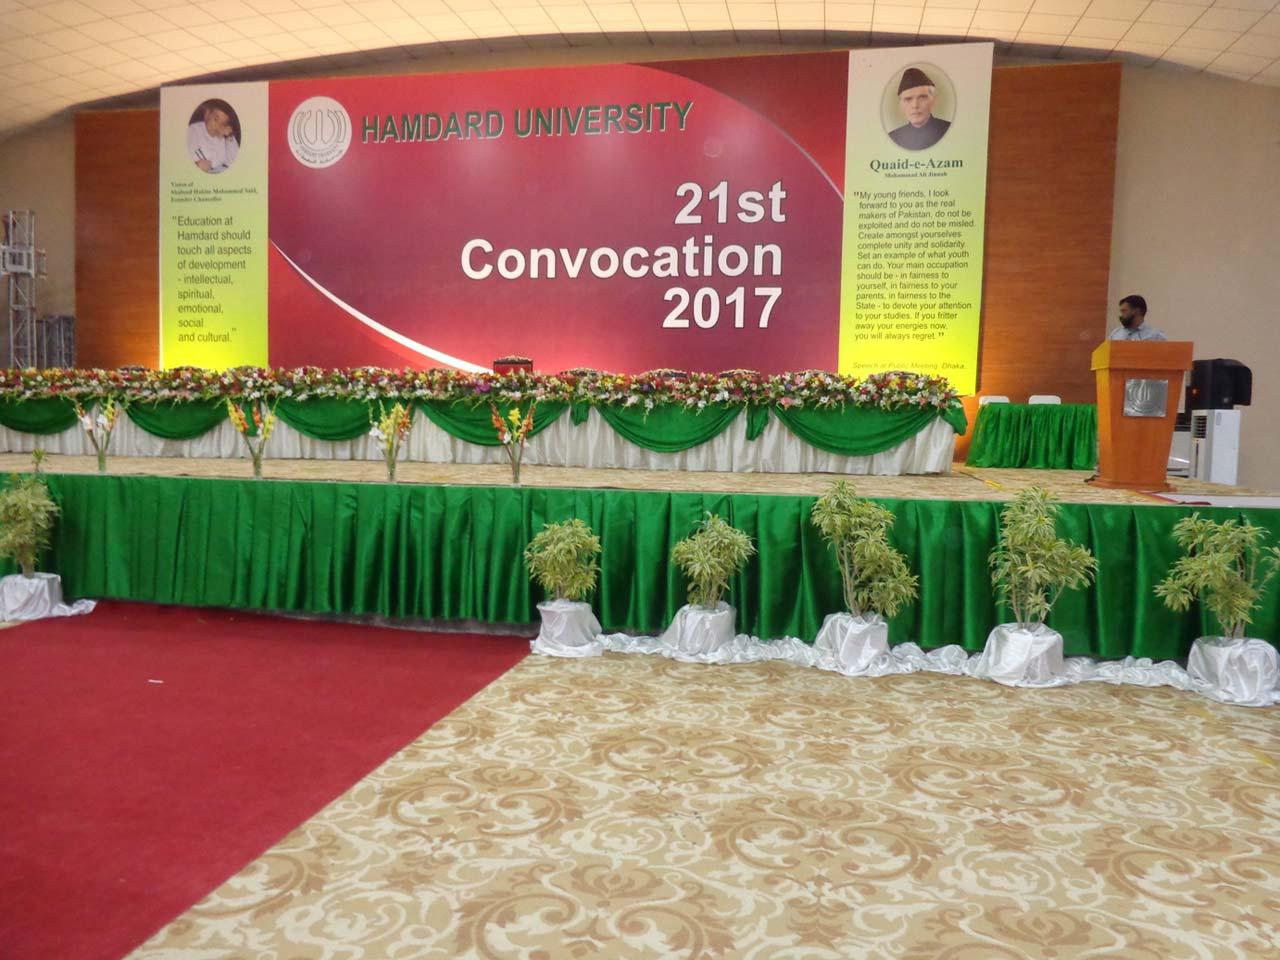 Hamdard University Convocation